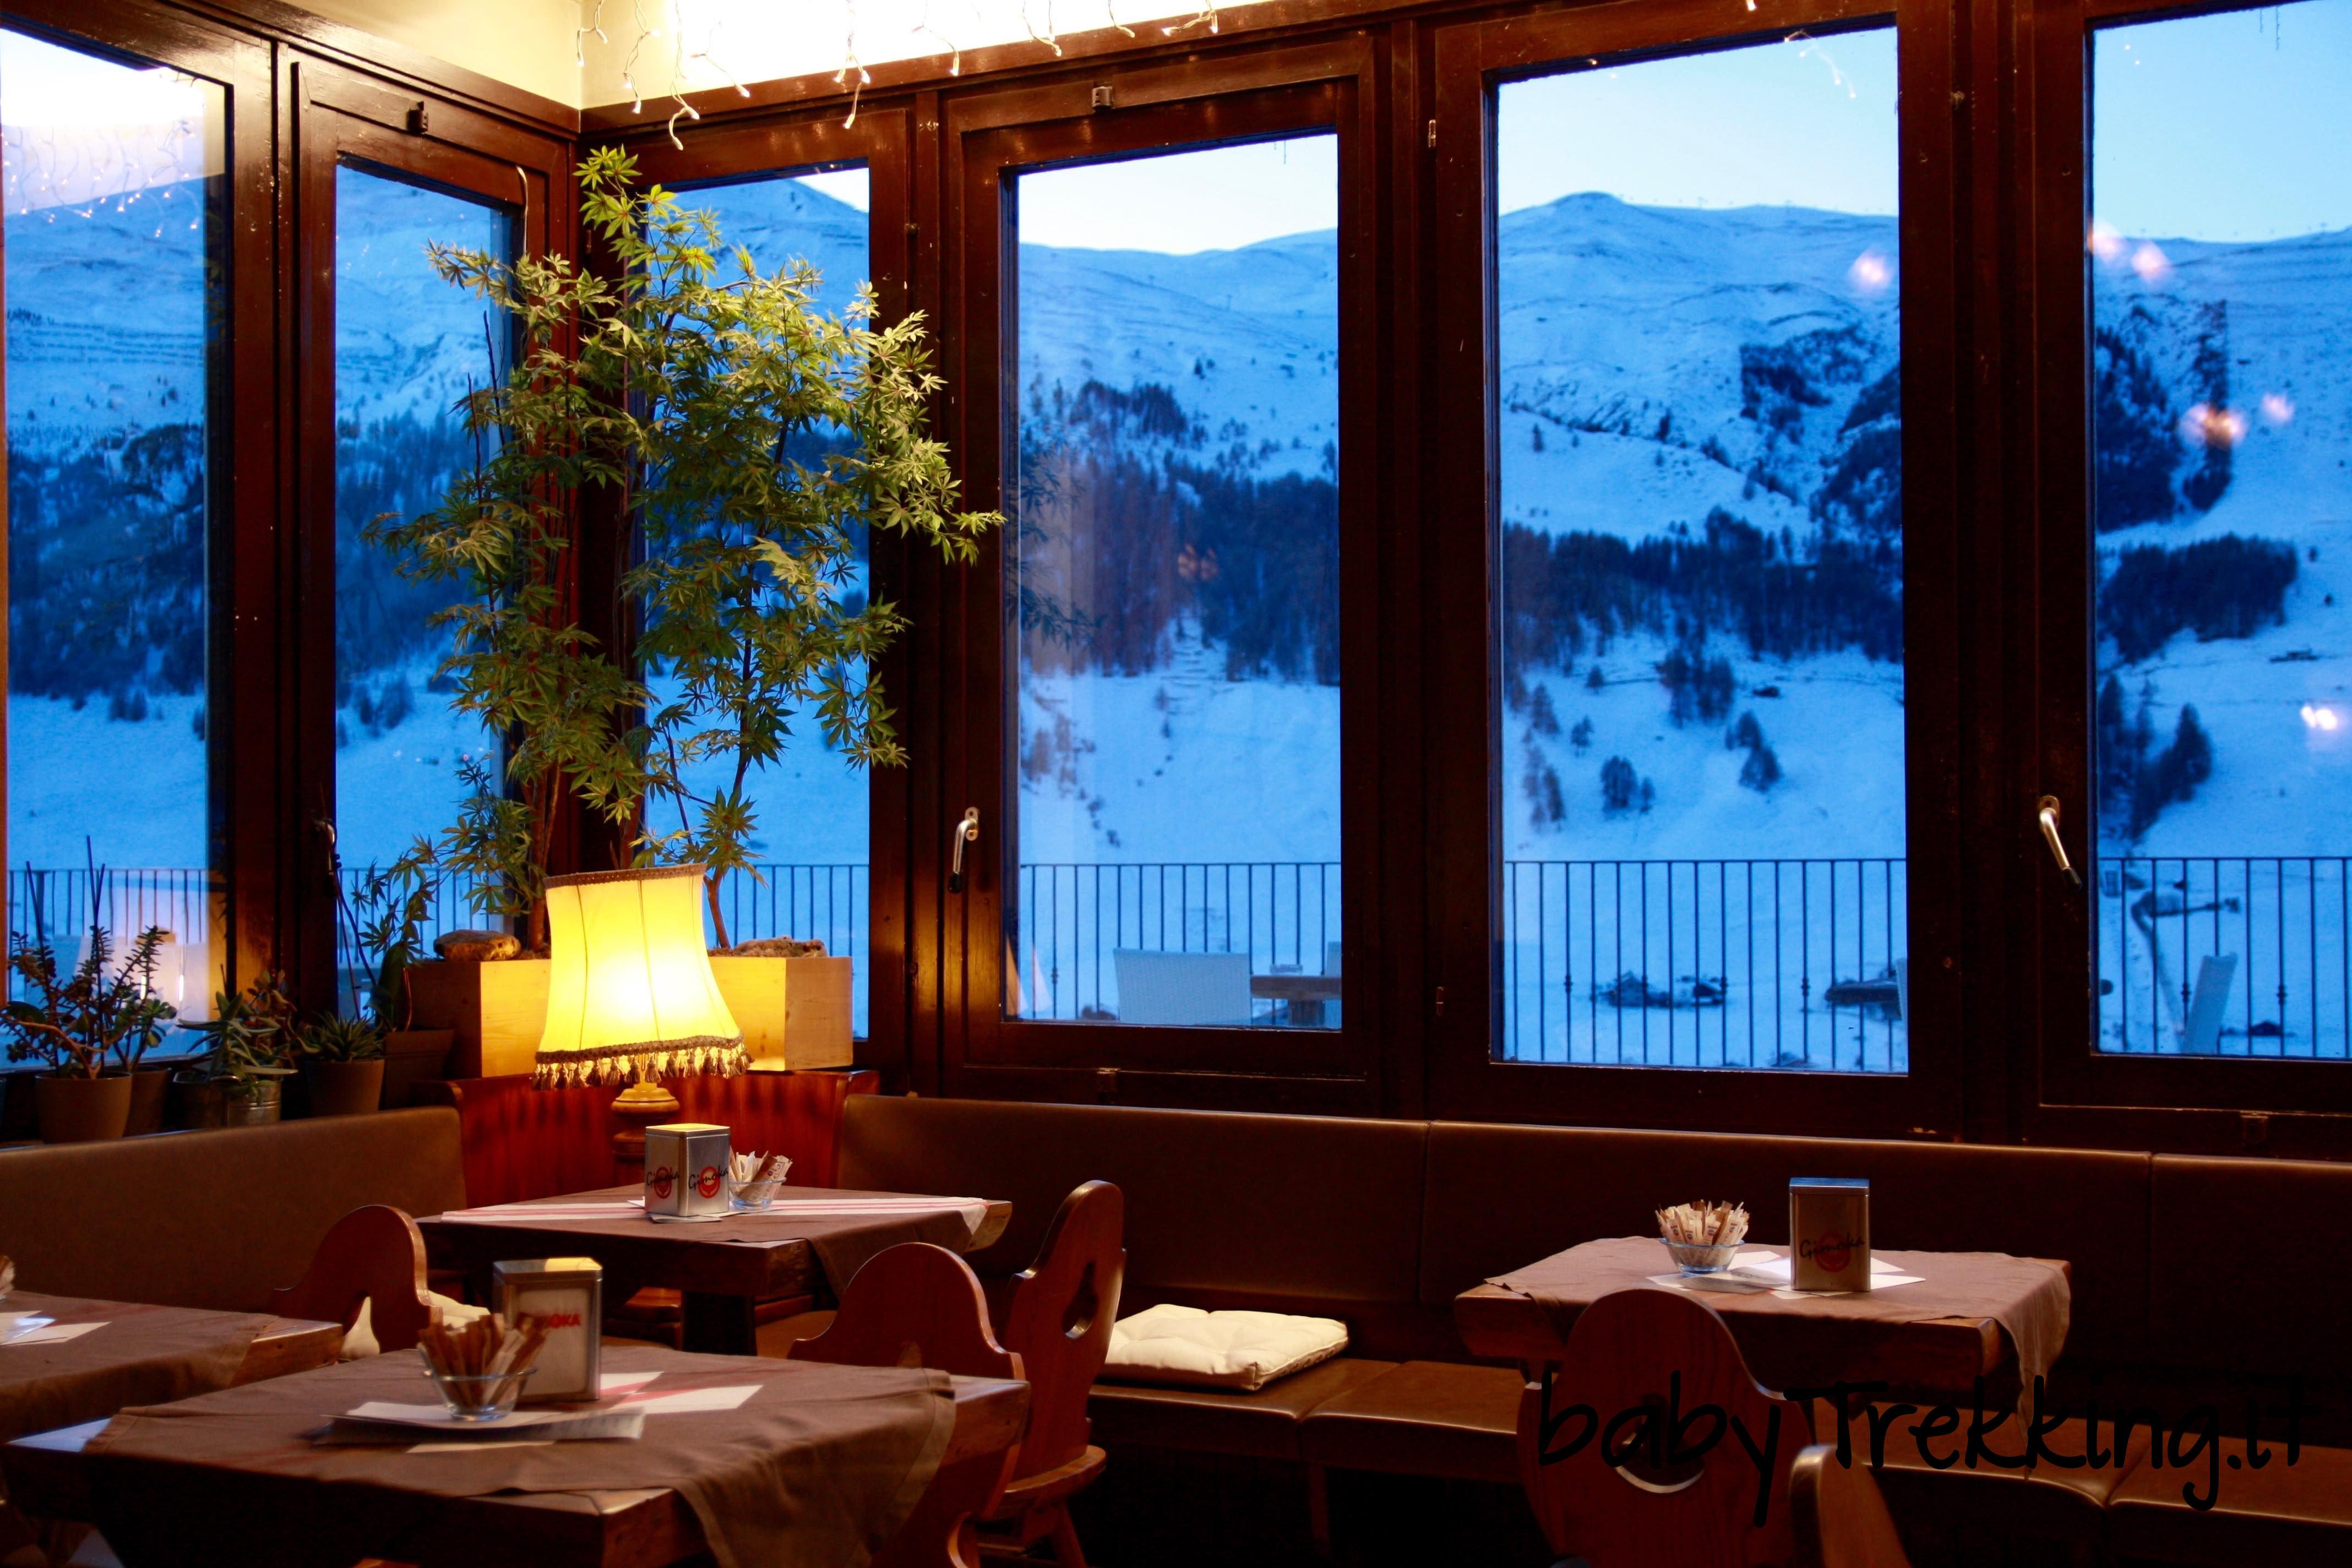 Alpen Village Hotel, coi bambini a Livigno